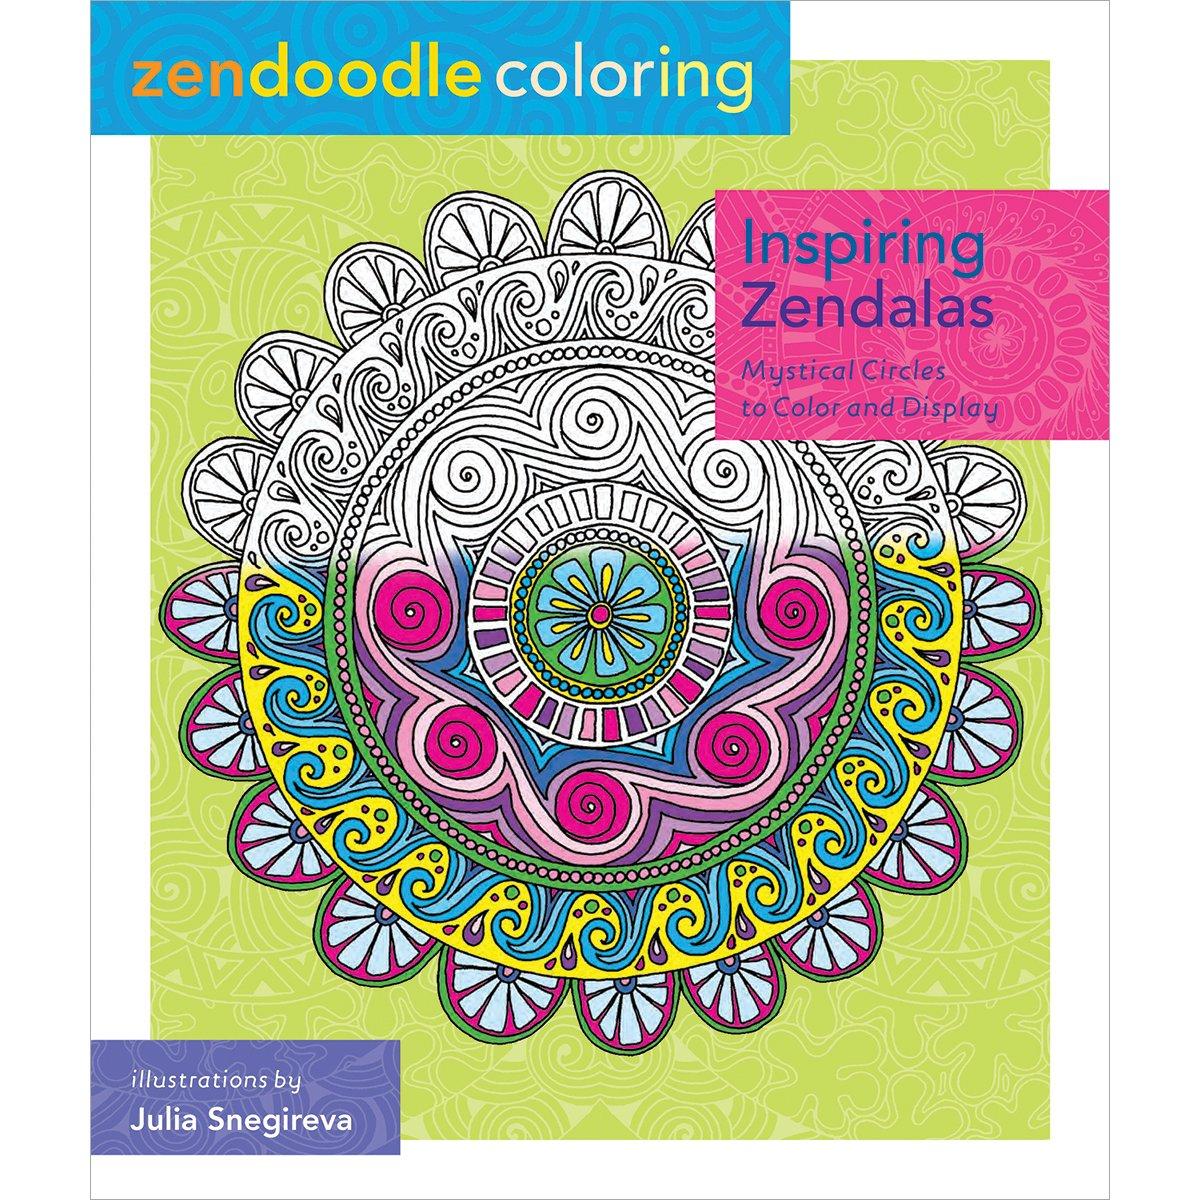 Zen coloring books for adults app - Amazon Com Zendoodle Coloring Inspiring Zendalas Mystical Circles To Color And Display 9781250086471 Julia Snegireva Books